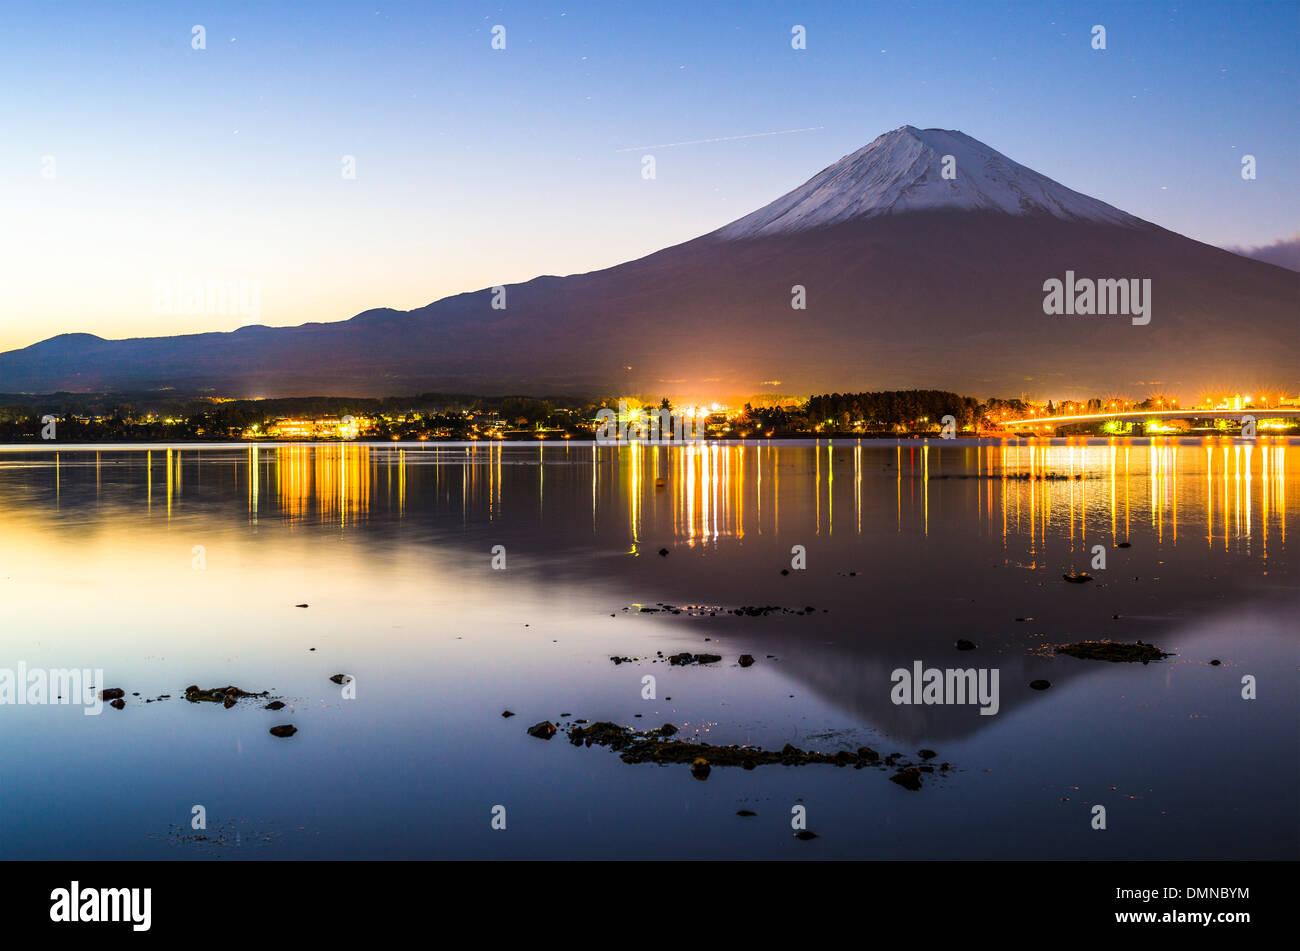 Mt. Fuji en el atardecer sobre el Lago Kawaguchi en Japón. Imagen De Stock